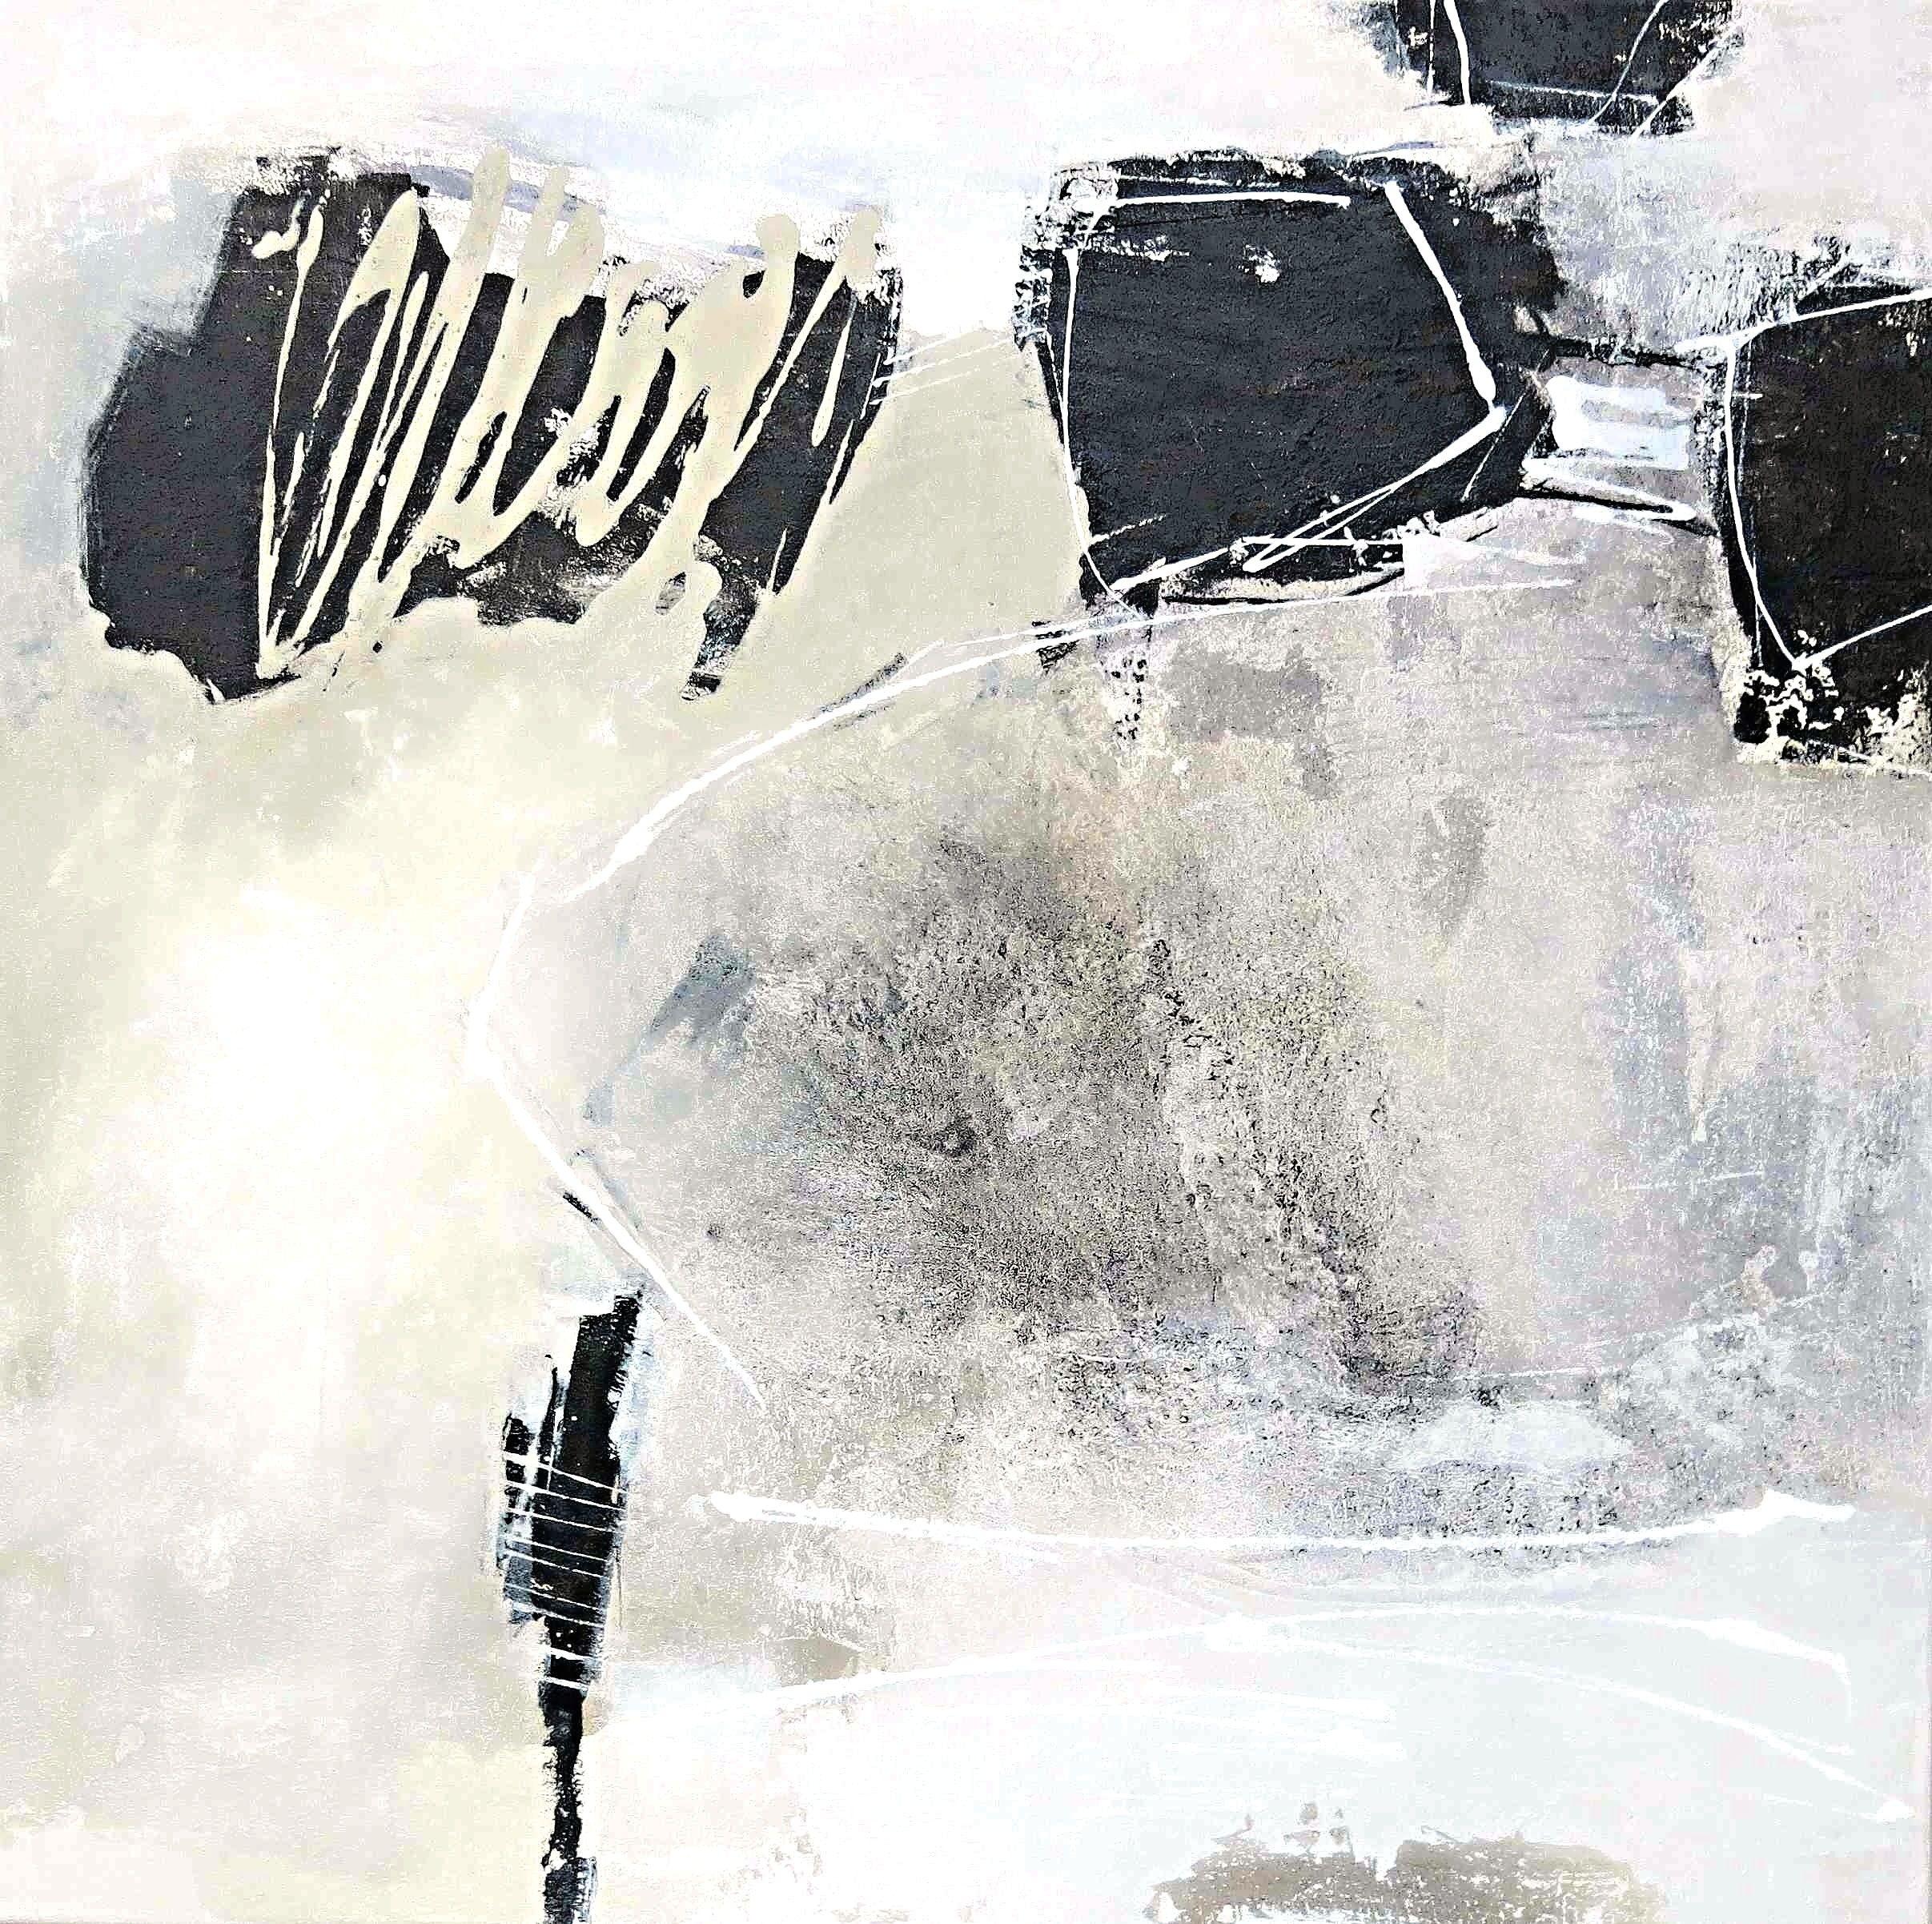 Renate Migas o.T. (Serie Unbunt) 0,80 m x 0,80 m Mischtechnik auf Leinwand